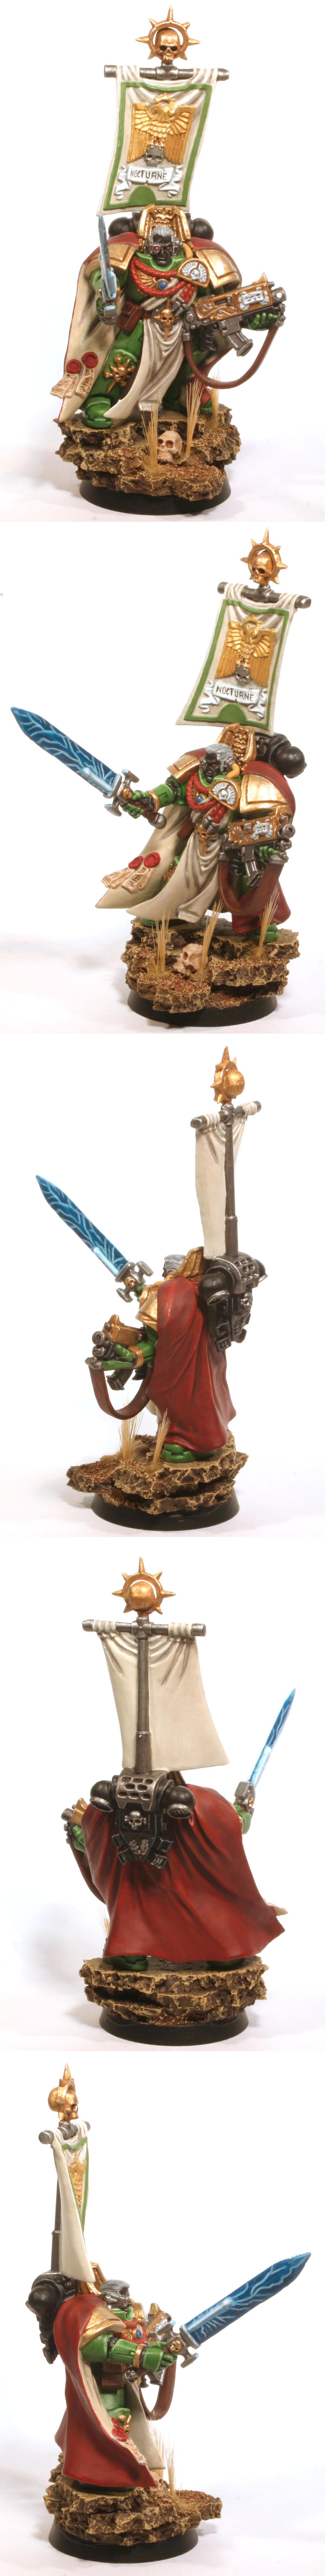 Assault On Black Reach, Banner, Captain, Power Sword, Salamanders